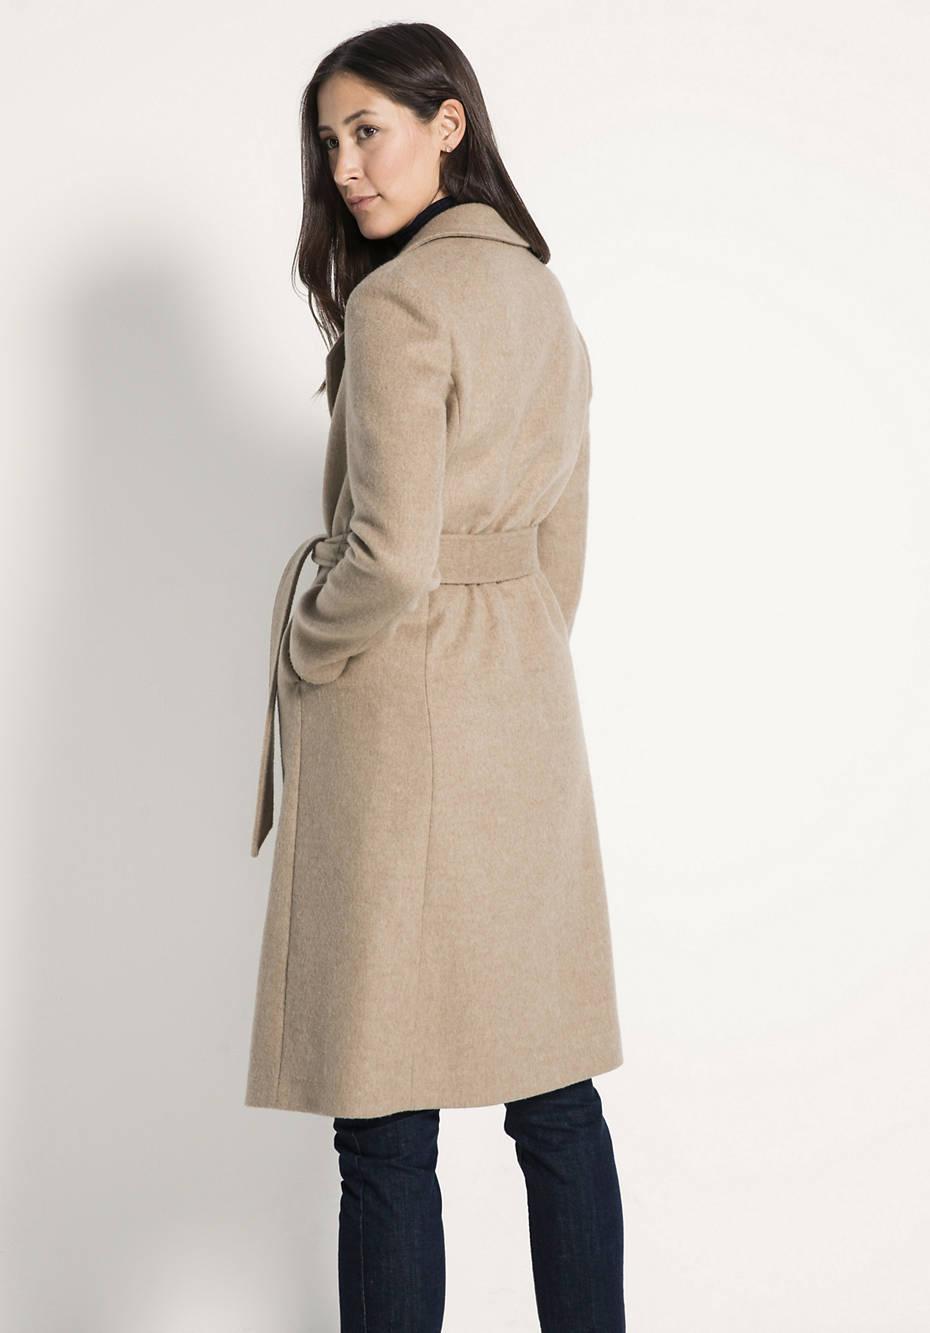 Mantel aus Kamelhaar mit Seide